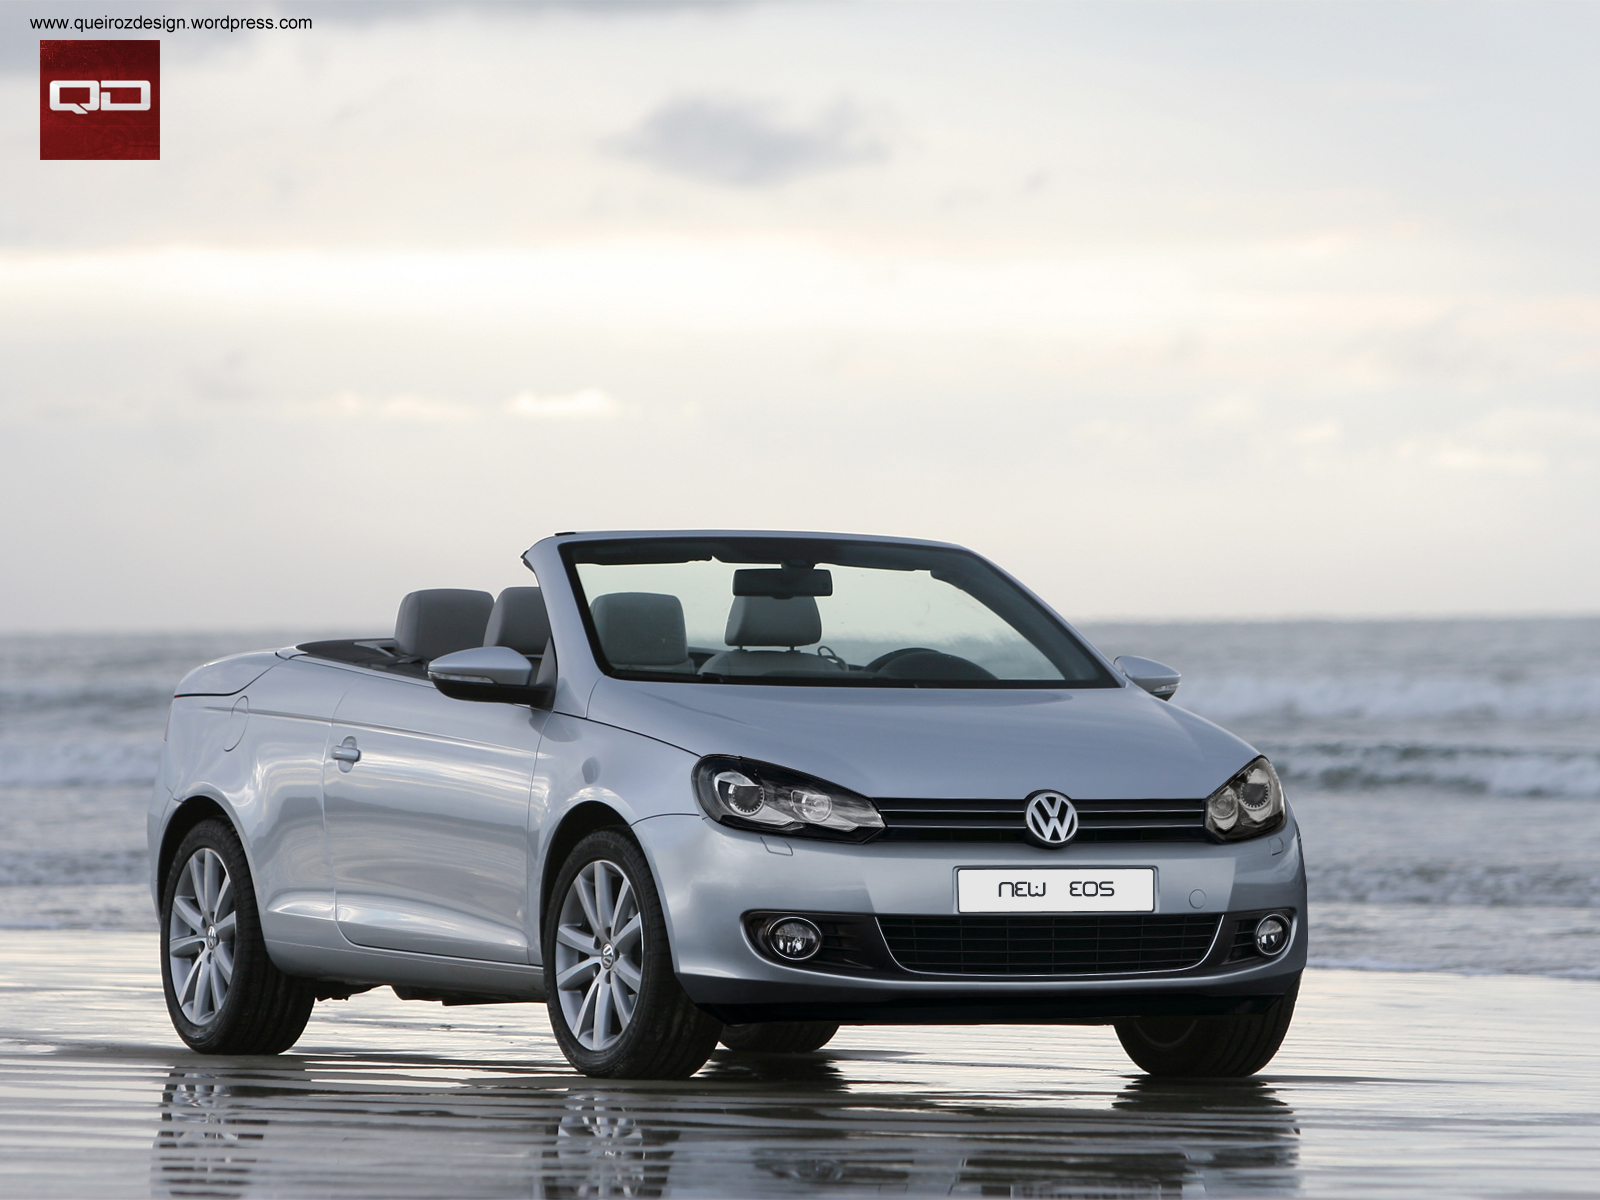 Volkswagen Eos 2011 - Clique na Imagem para Ampliar